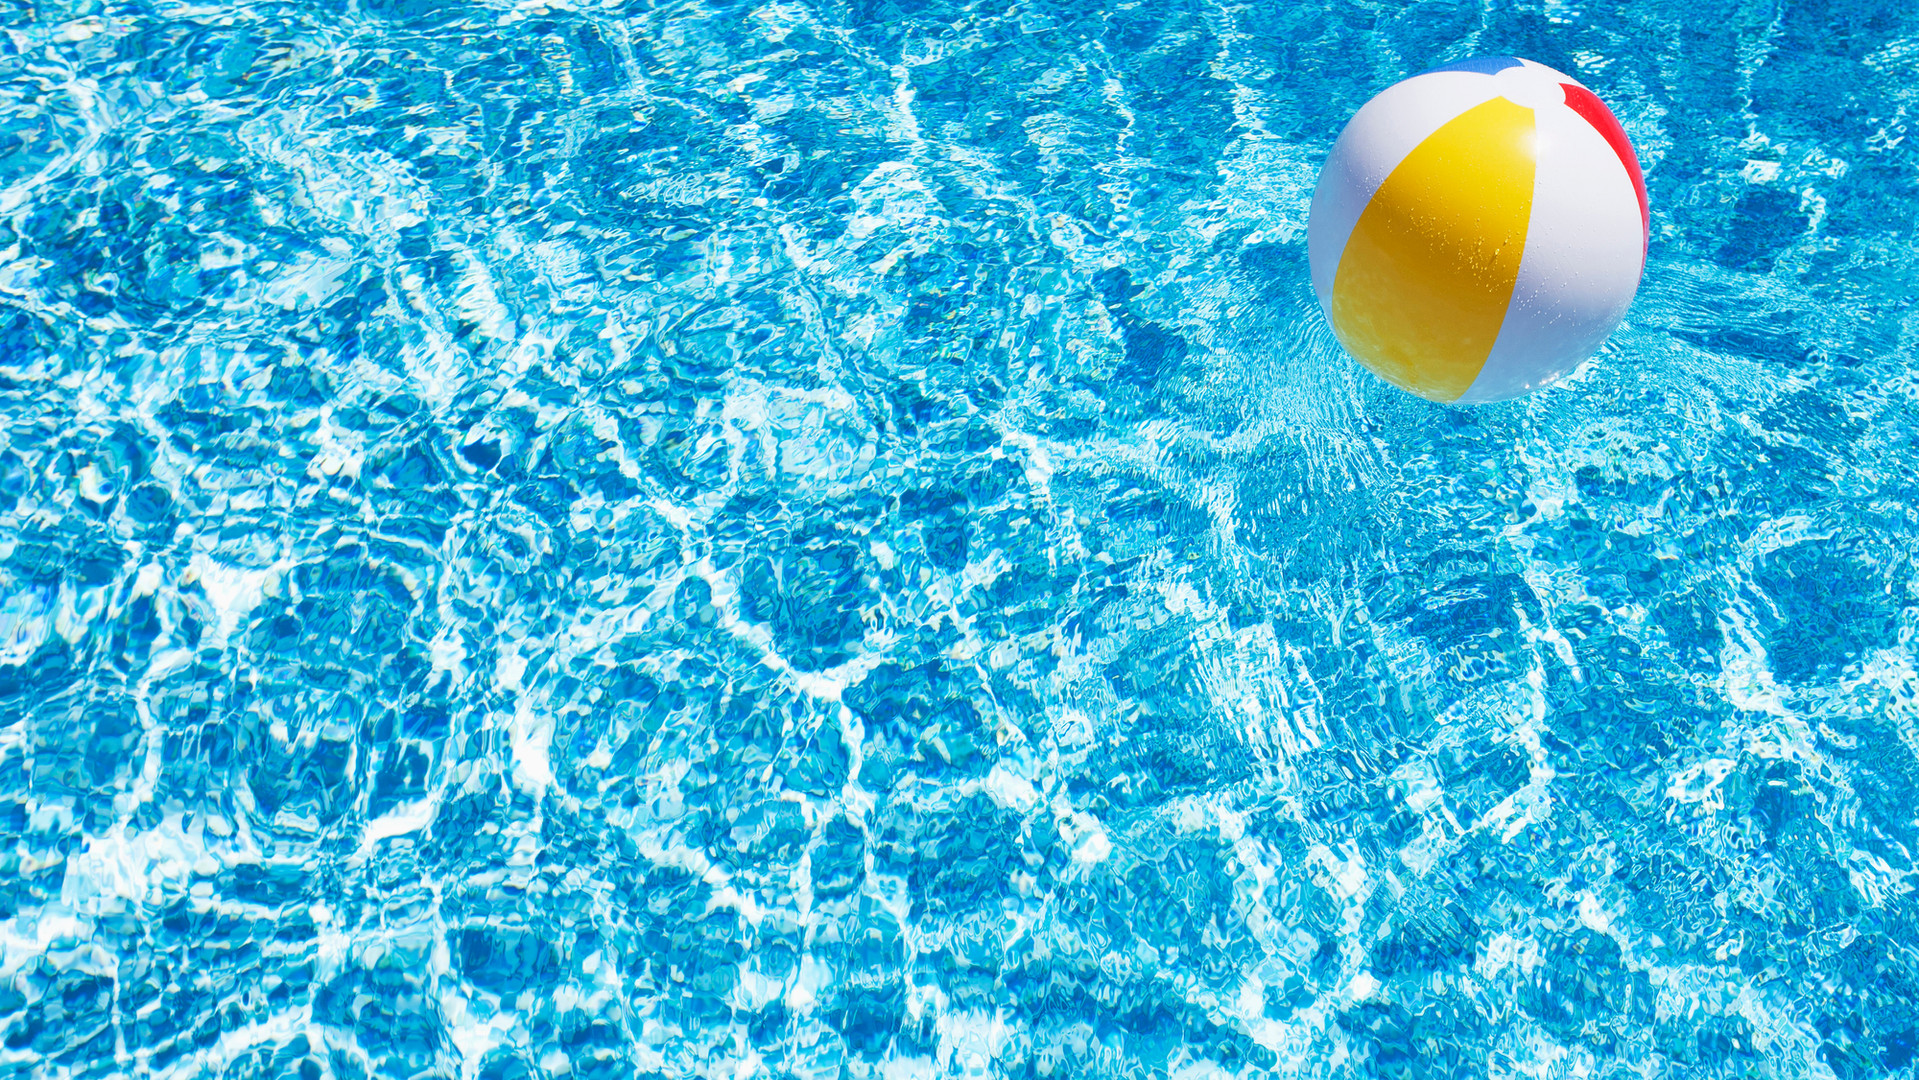 Beach Ball in Pool - pool equipment